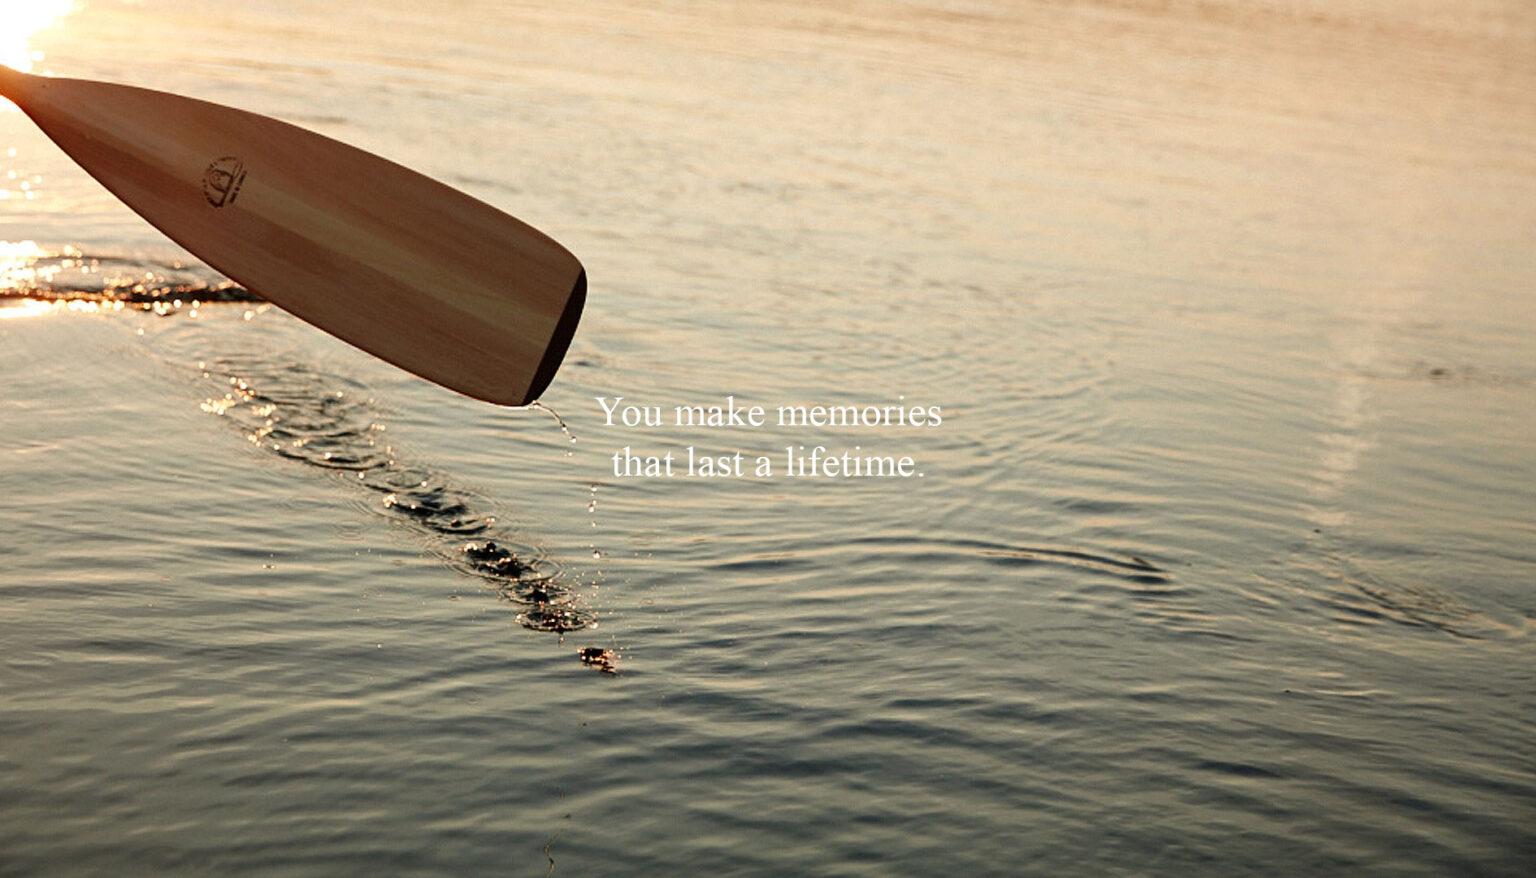 You make memories that last a lifetime.